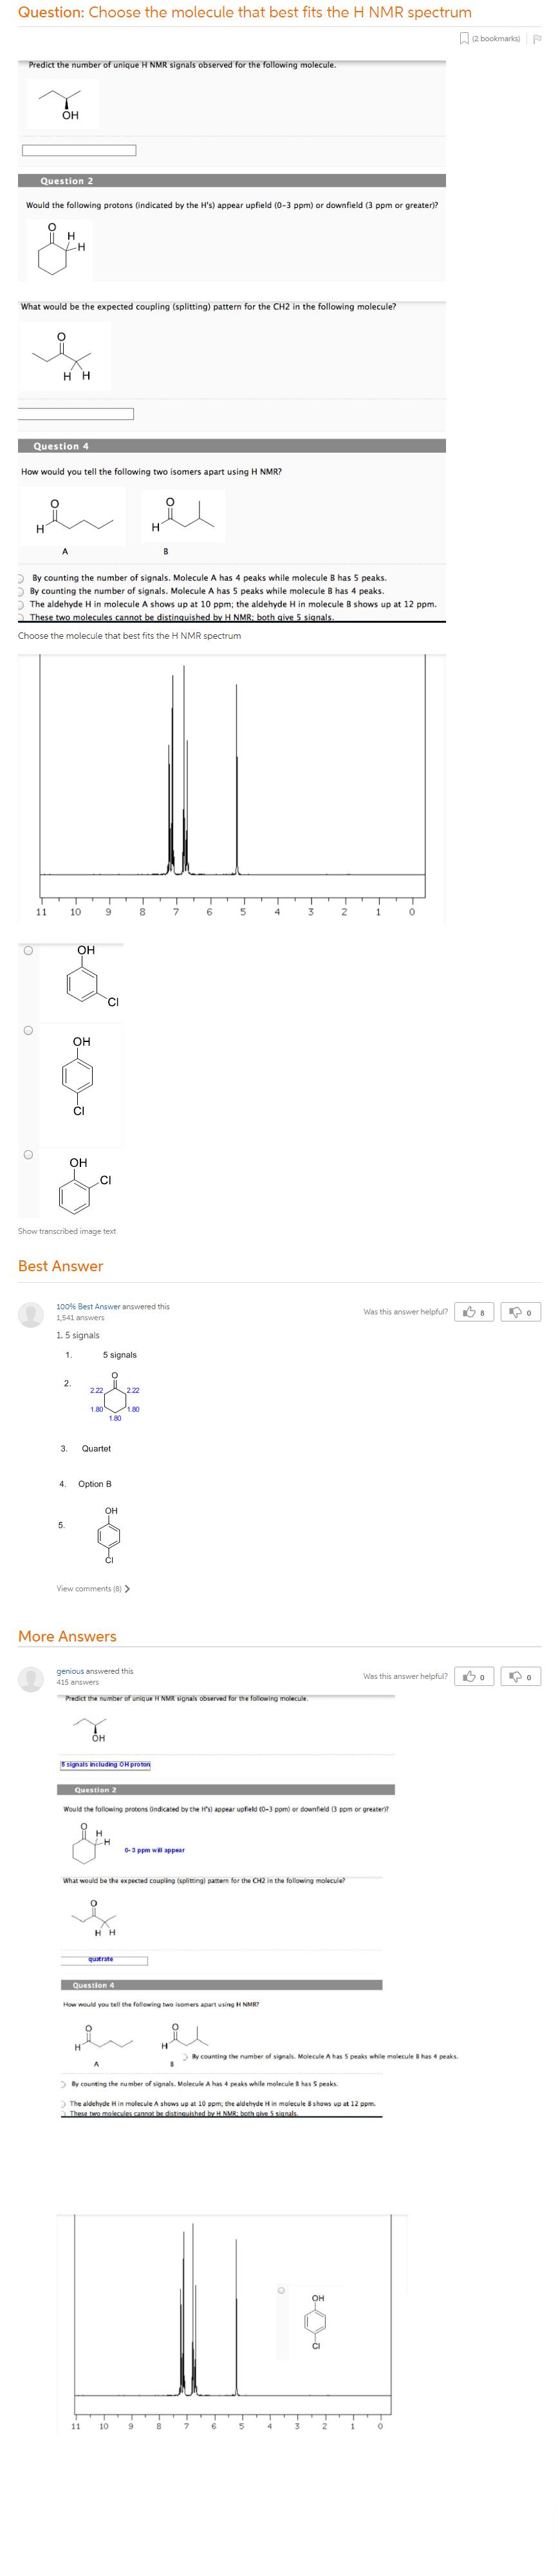 Choose The Molecule That Best Fits The H NMR Spectrum